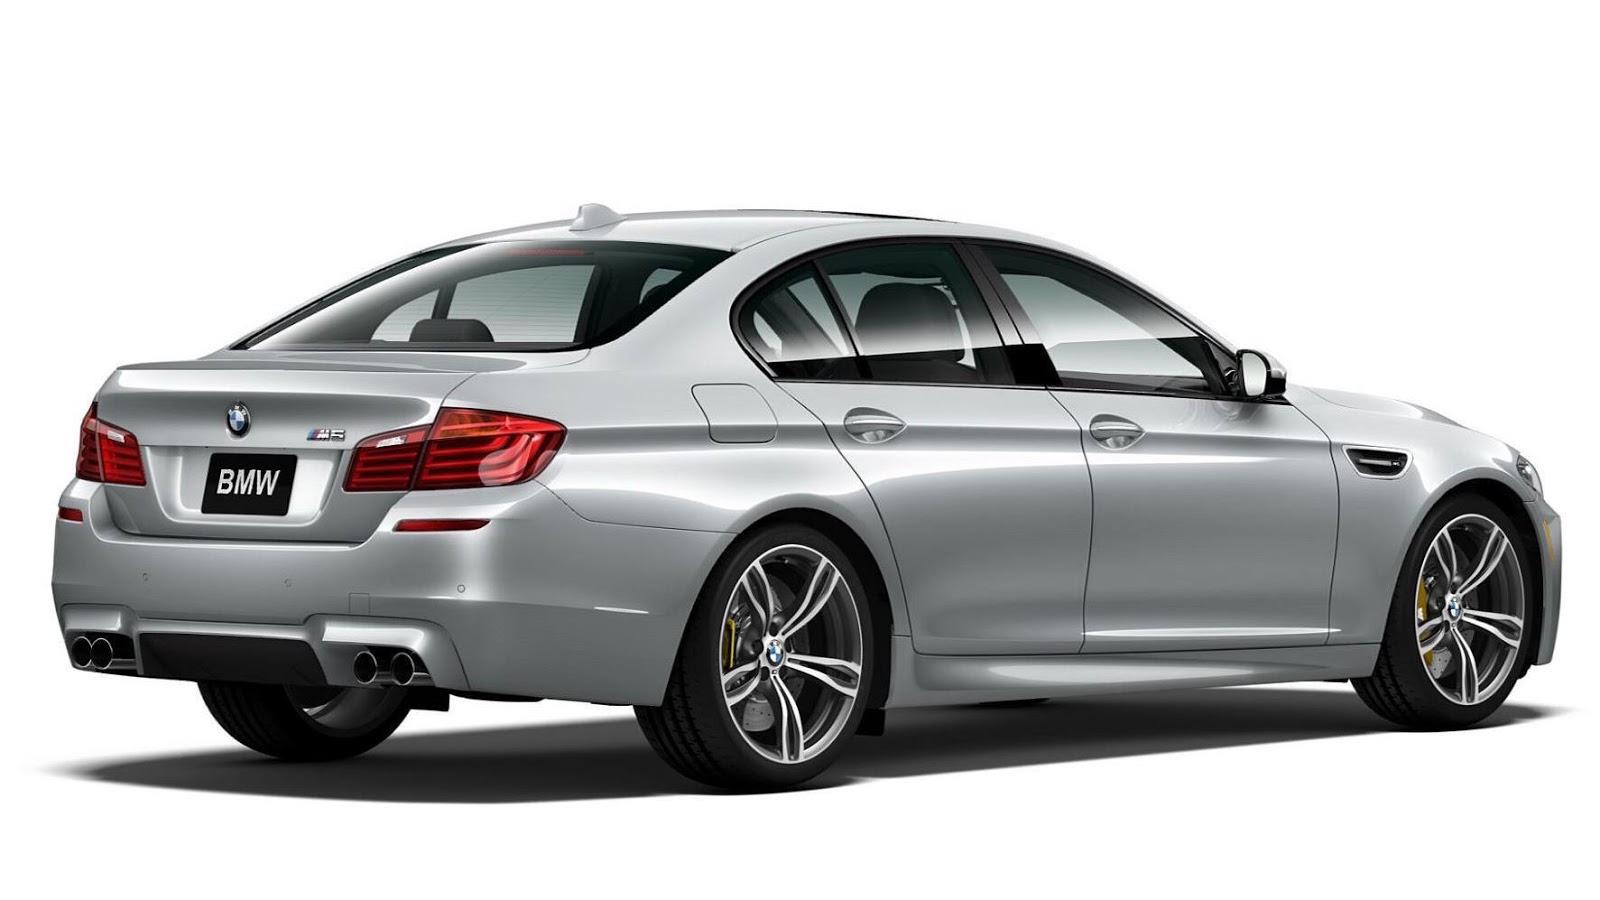 Ra mắt BMW M5 Pure Metal Silver bản giới hạn - 3